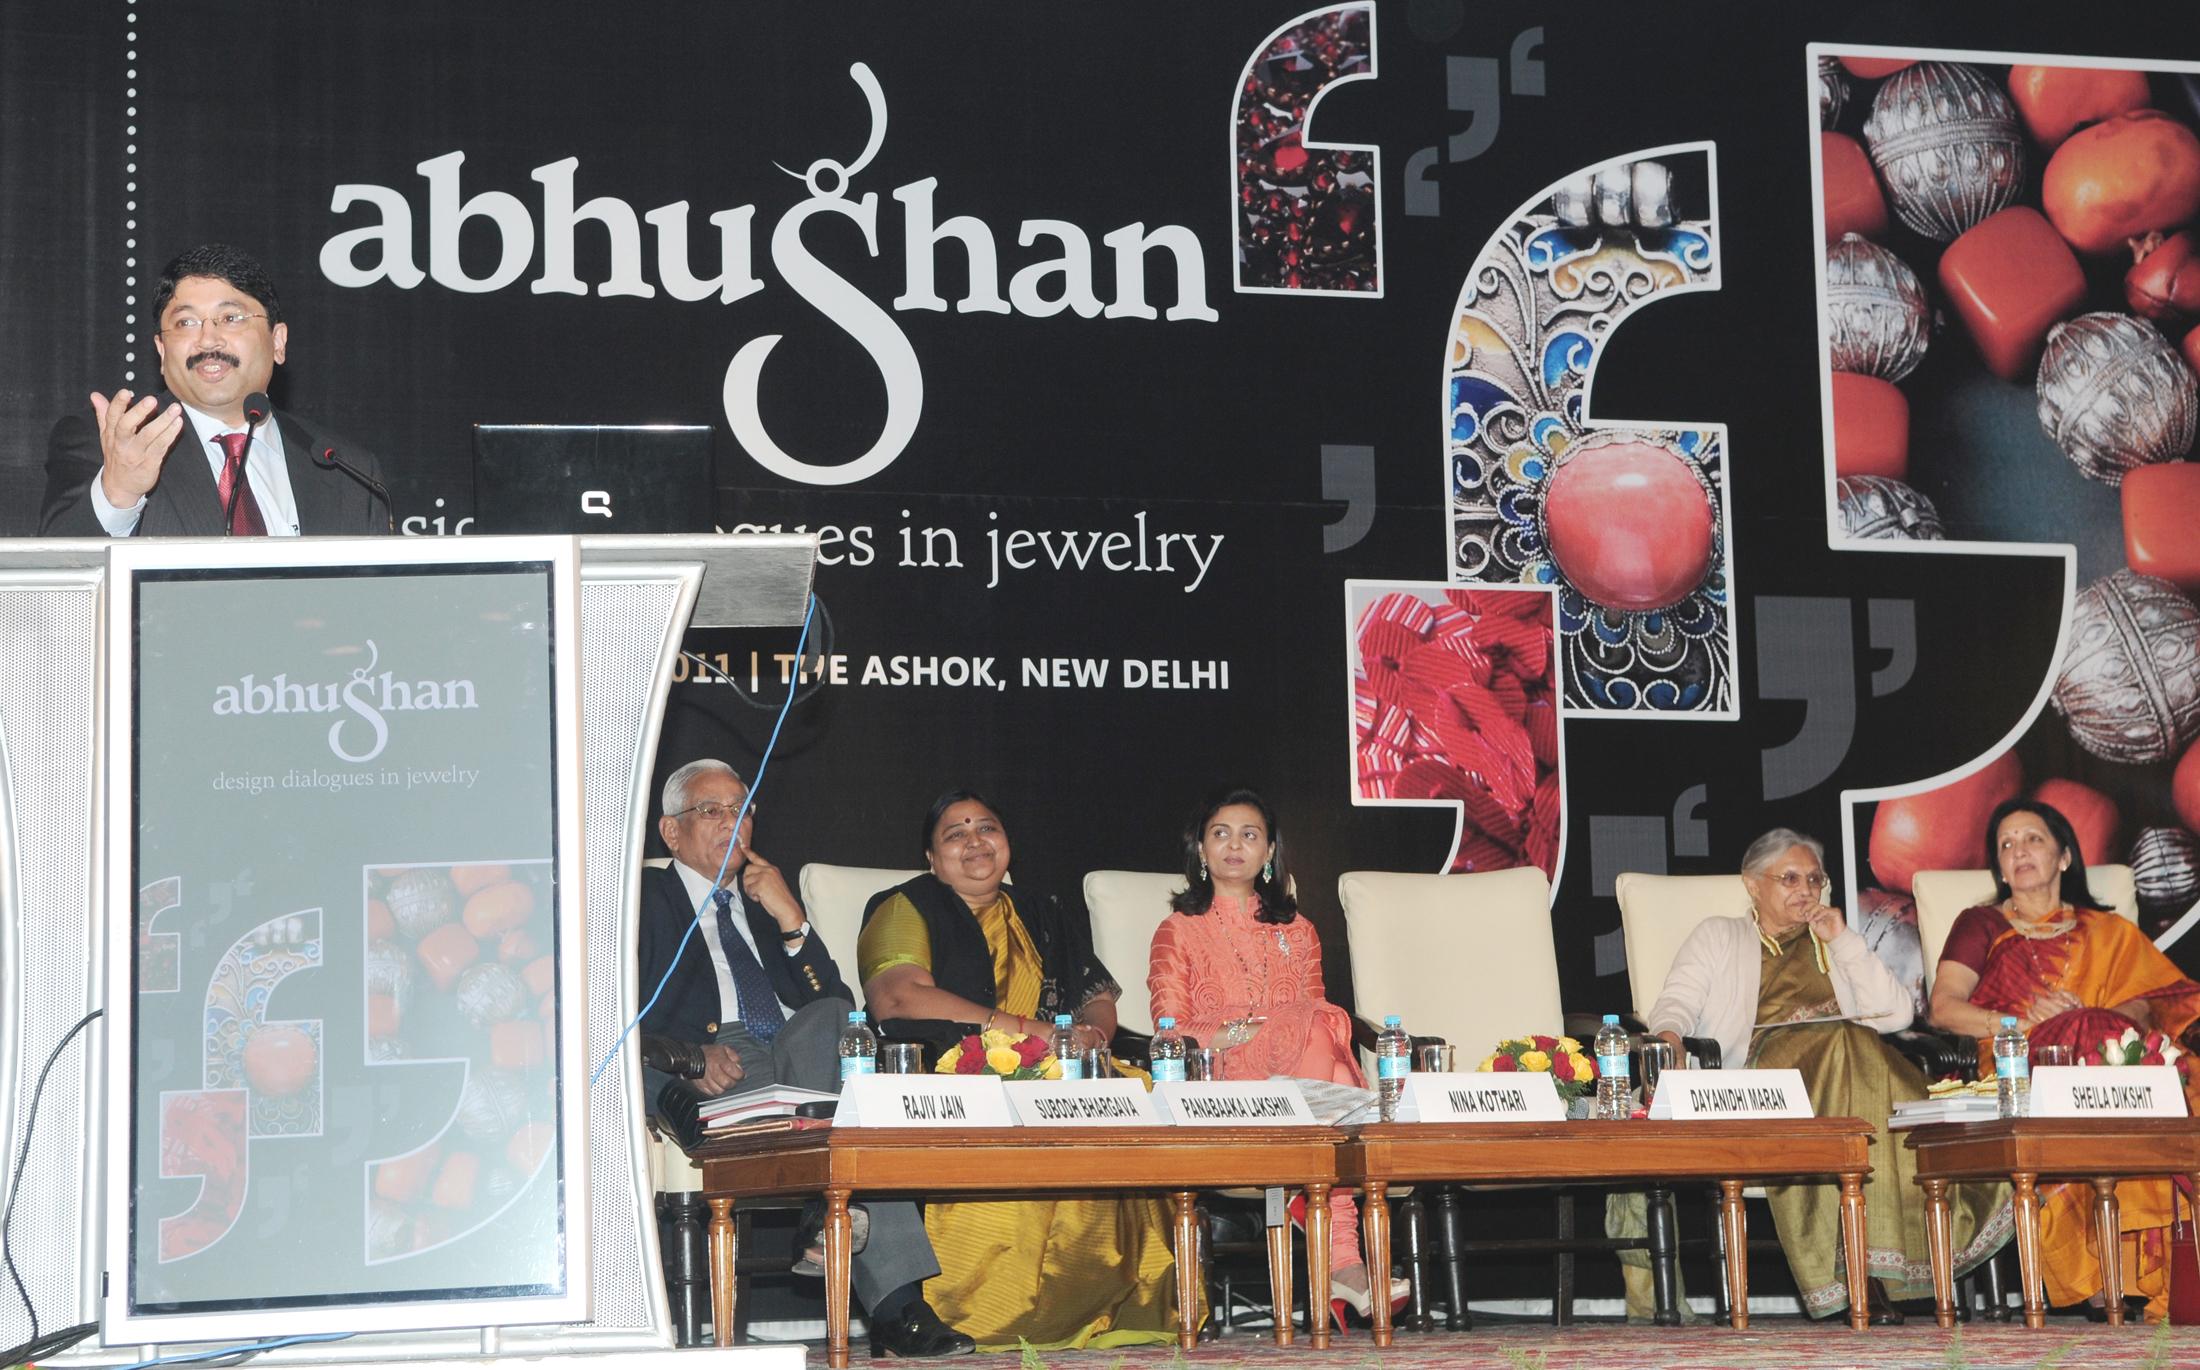 File Dayanidhi Maran Addressing At The Inauguration Of The Abhushan